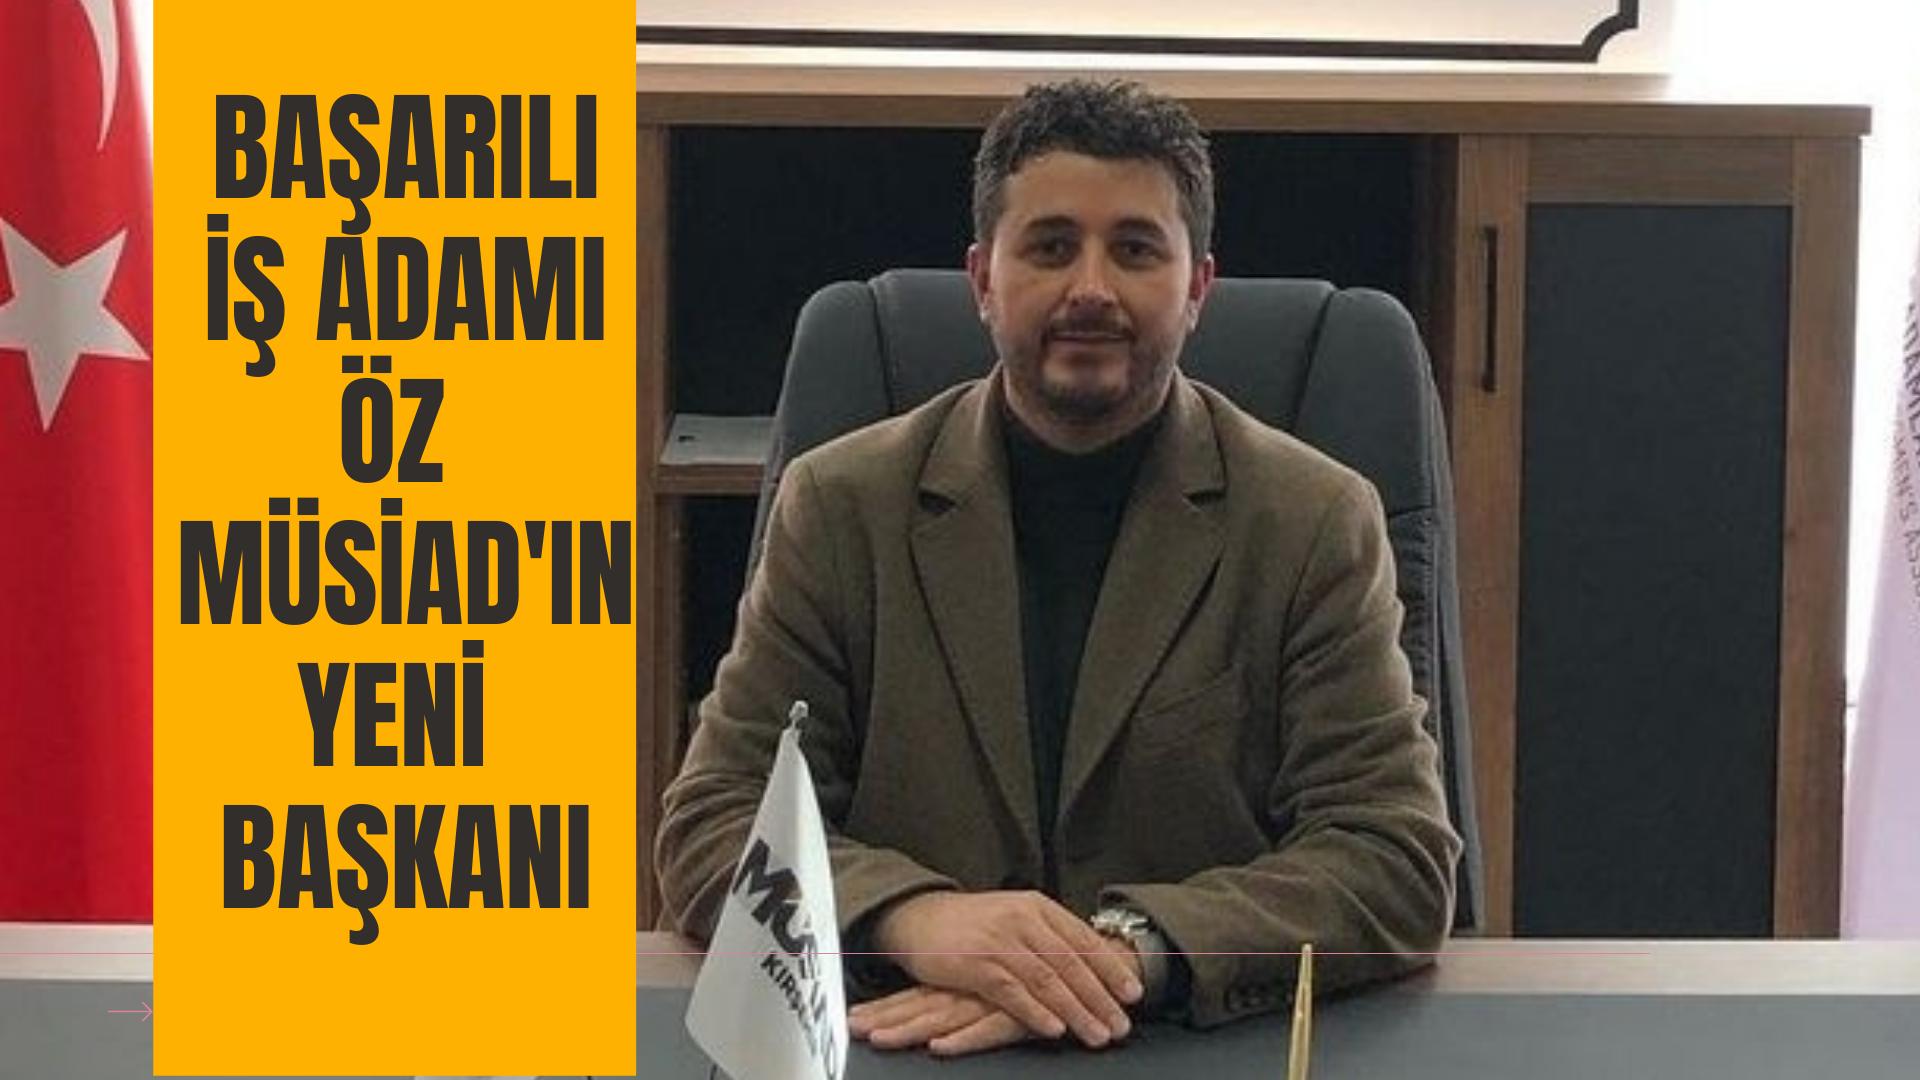 MÜSİAD'IN Yeni Başkanı Öz oldu